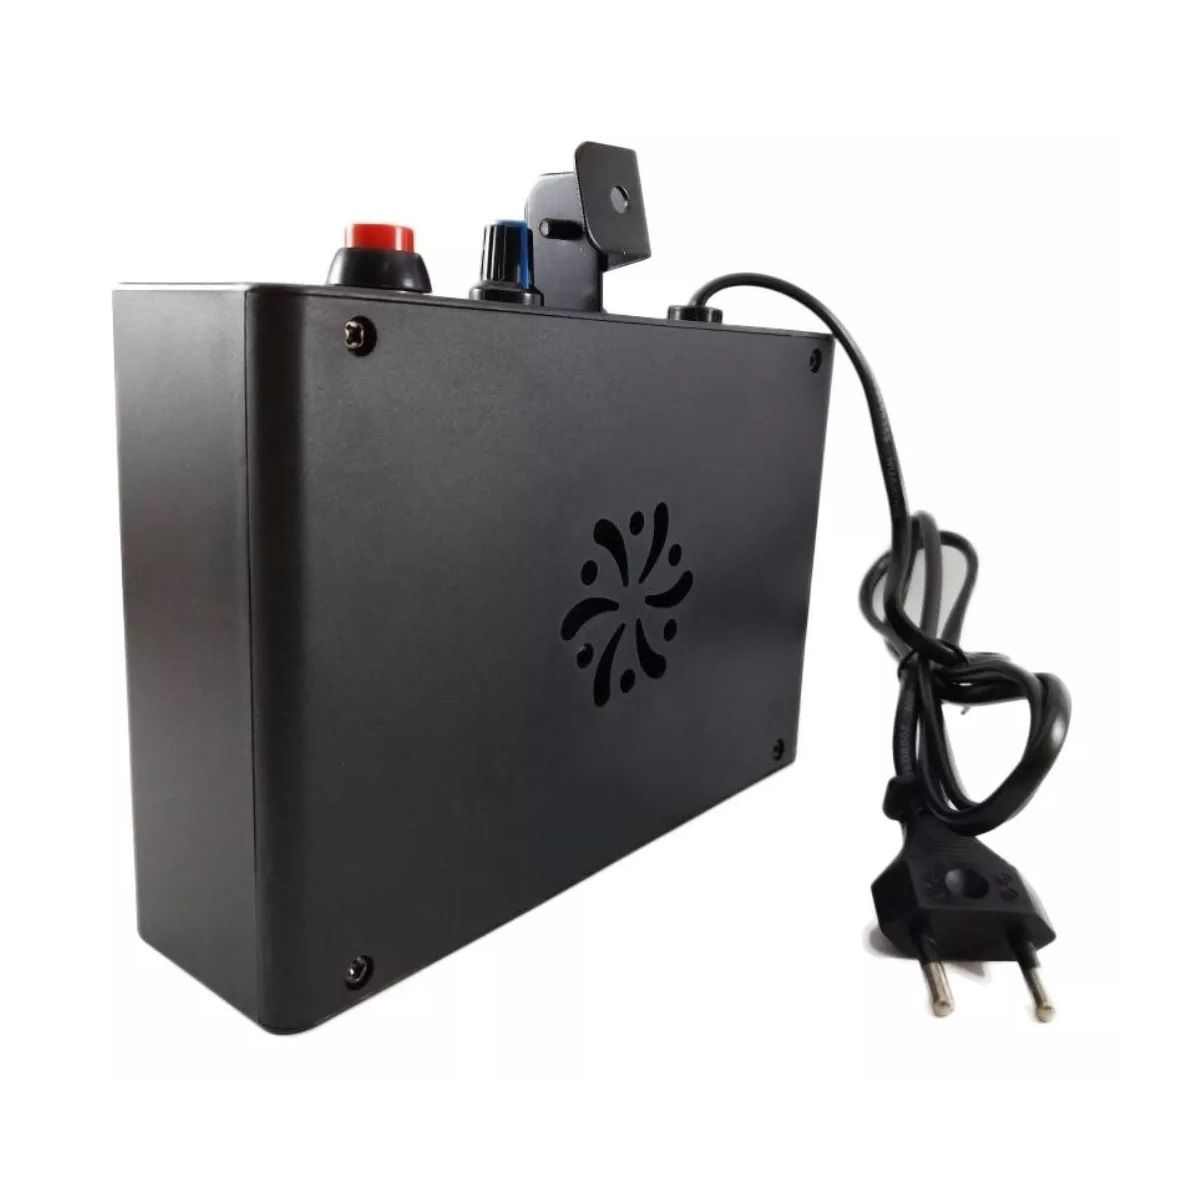 Kit 2x Strobo 12 Leds RGB + 2x Strobo 12 Leds Branco - YX-043RGB+YX-043W